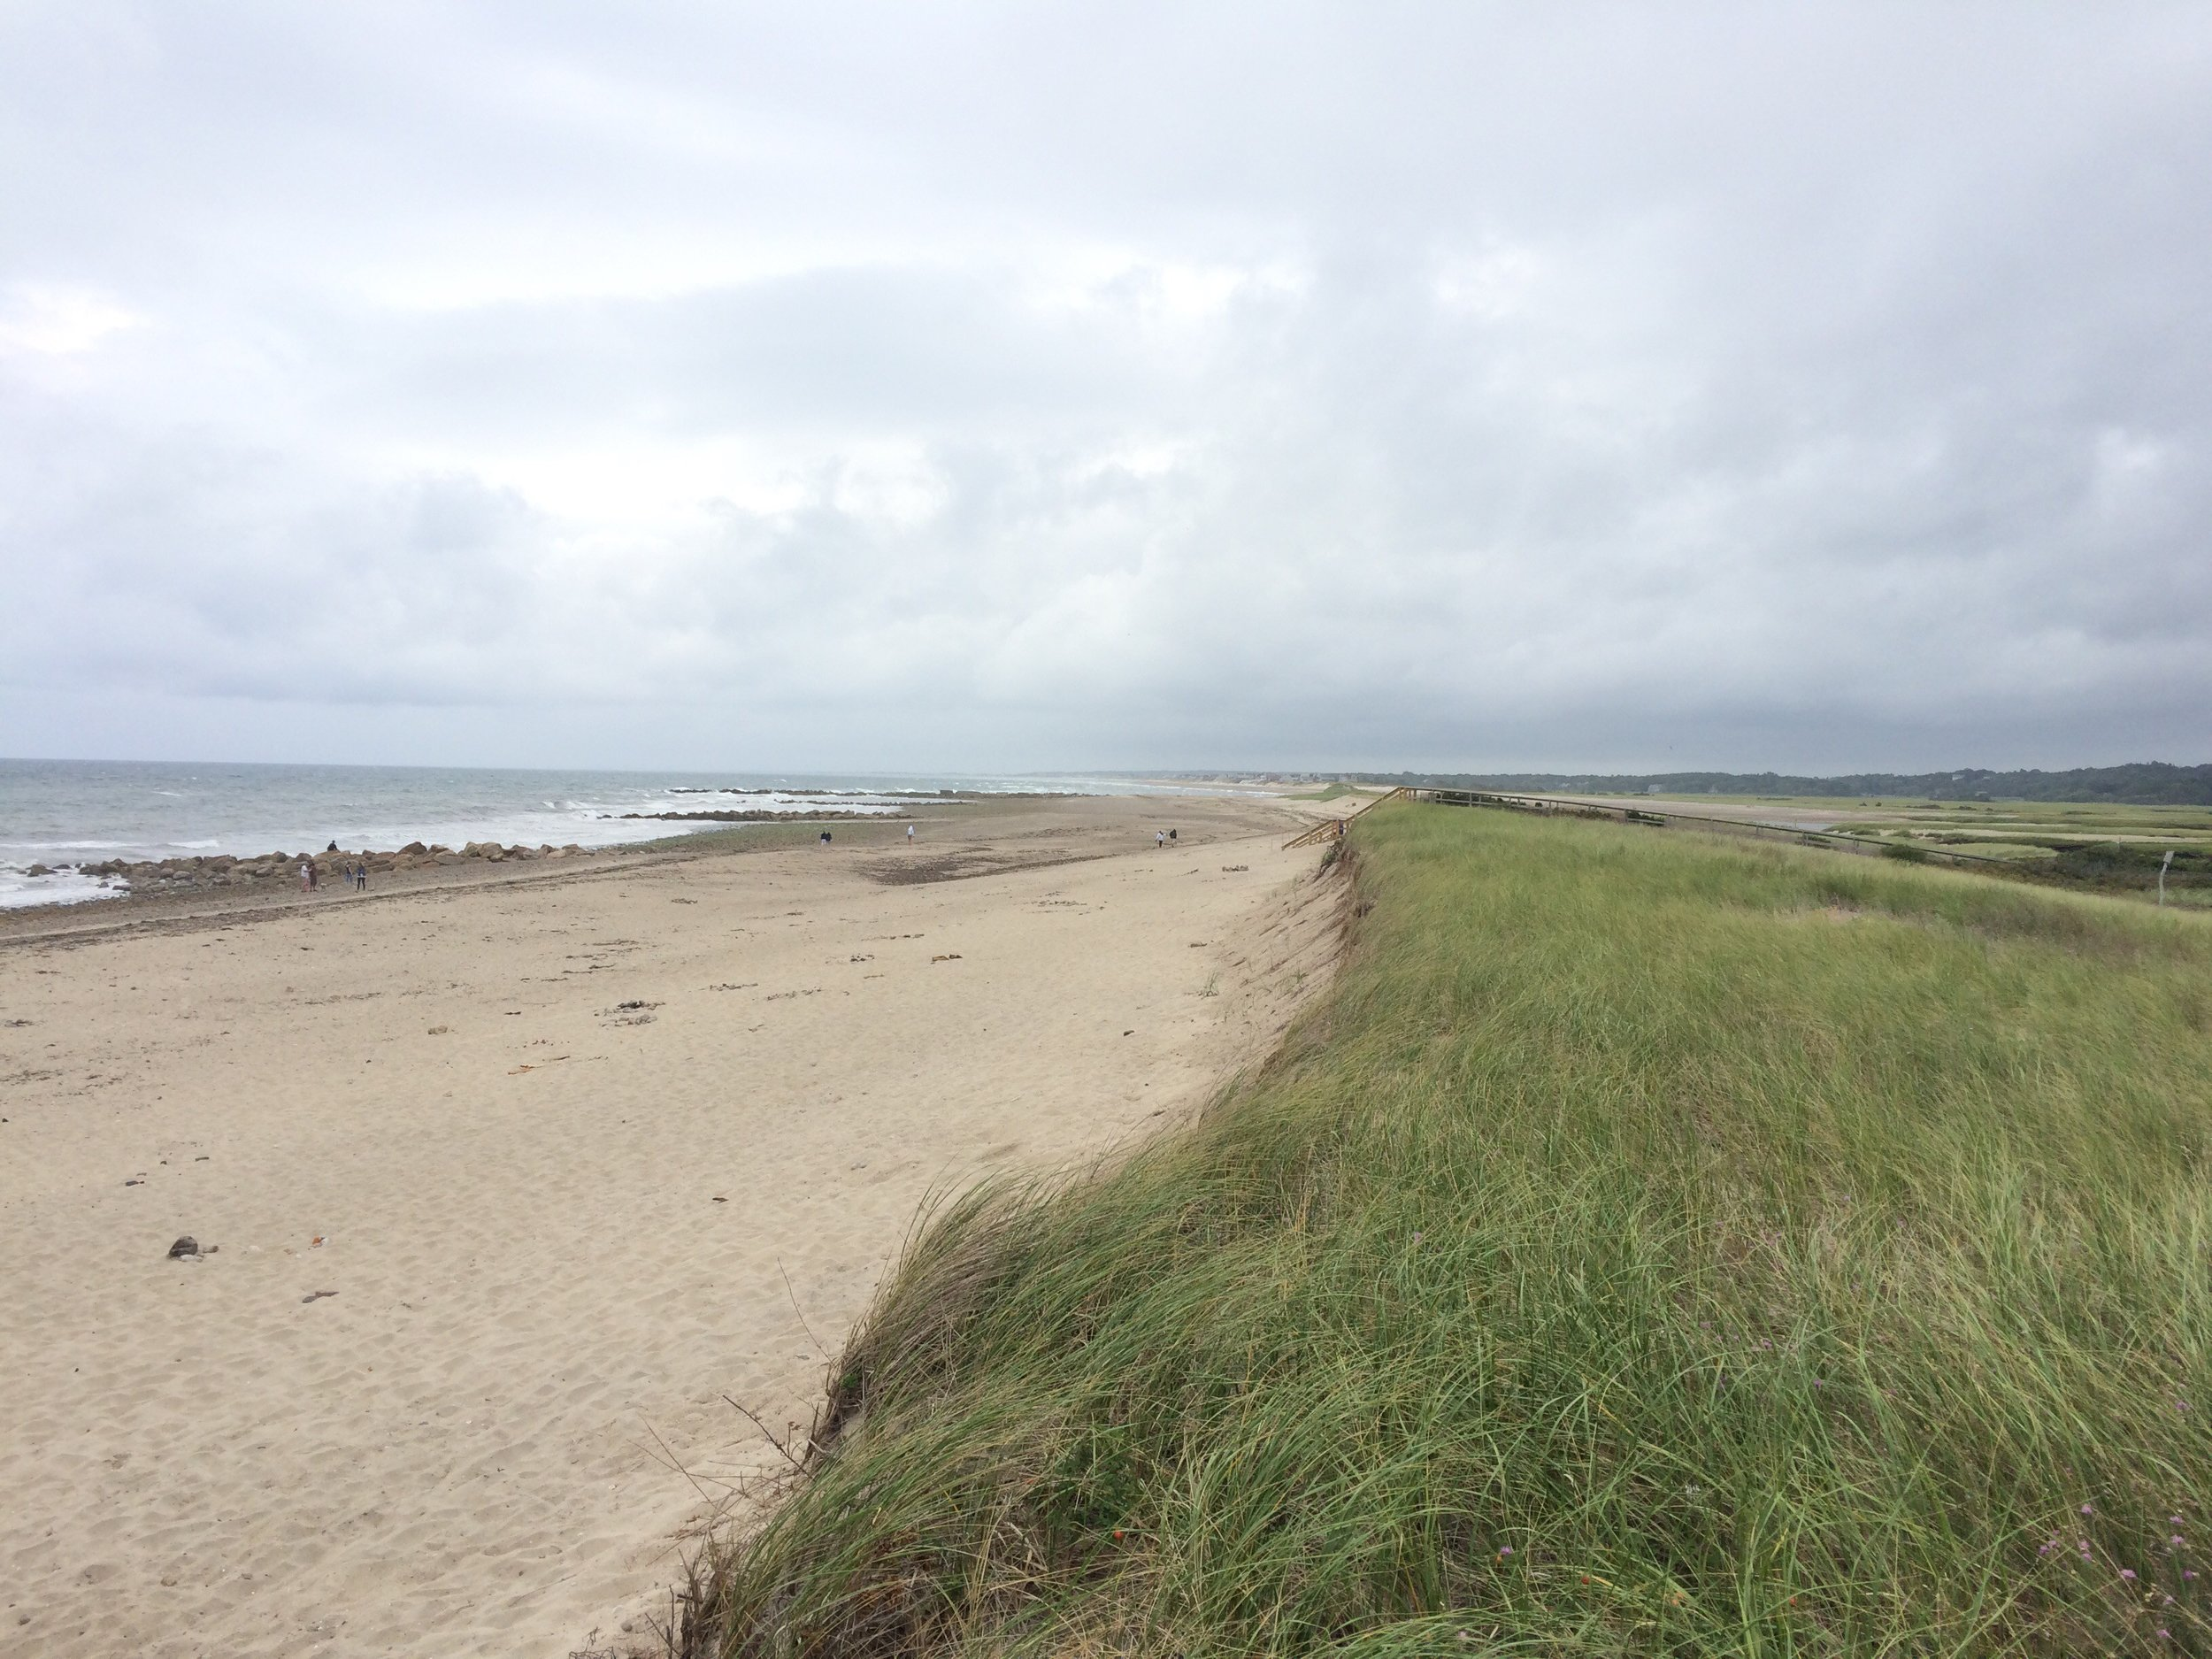 Sea meets land at Cape Cod near Sandwich, Massachusetts.